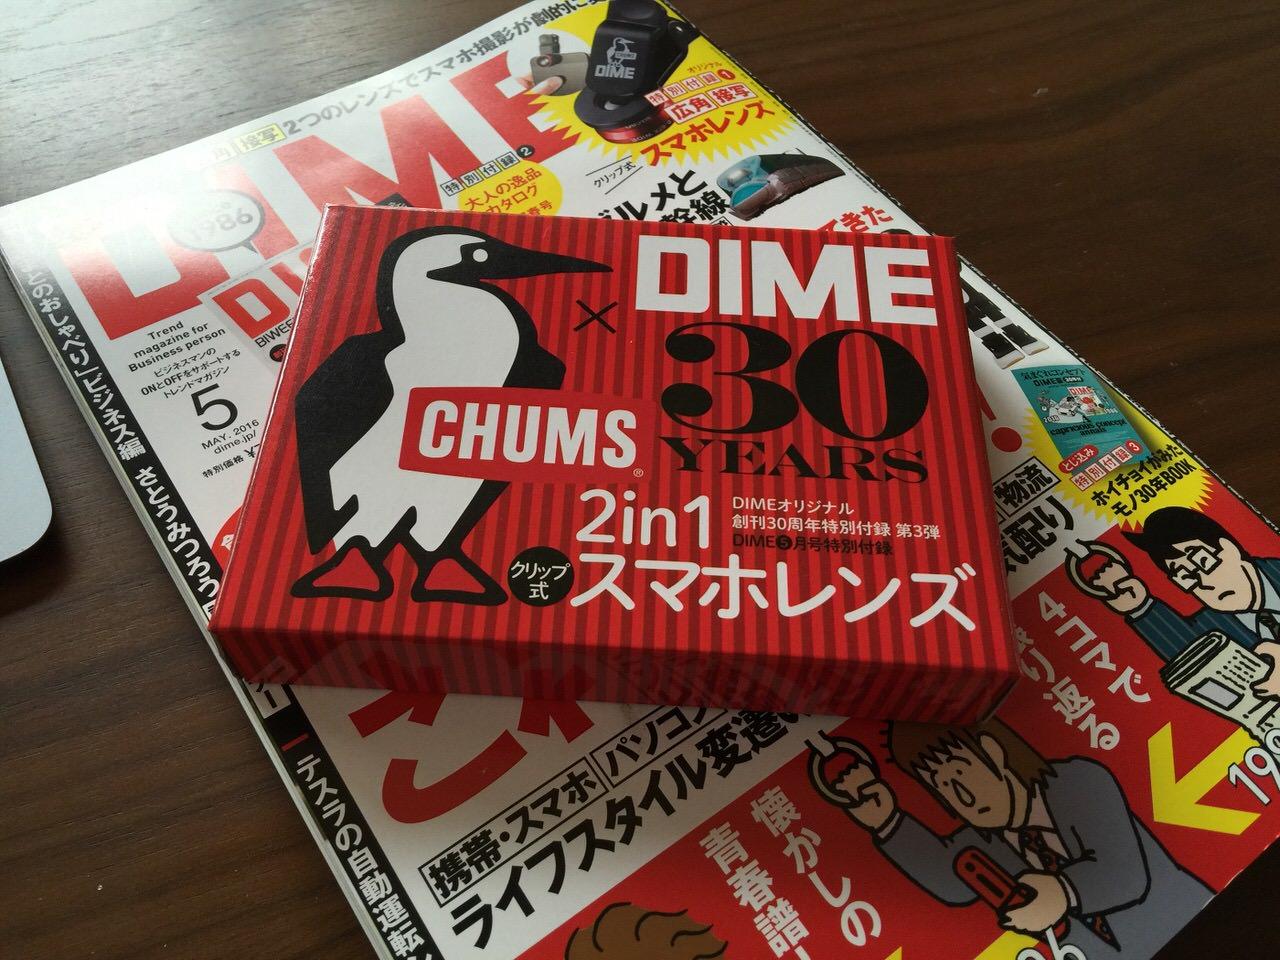 Dime chums lens 2361